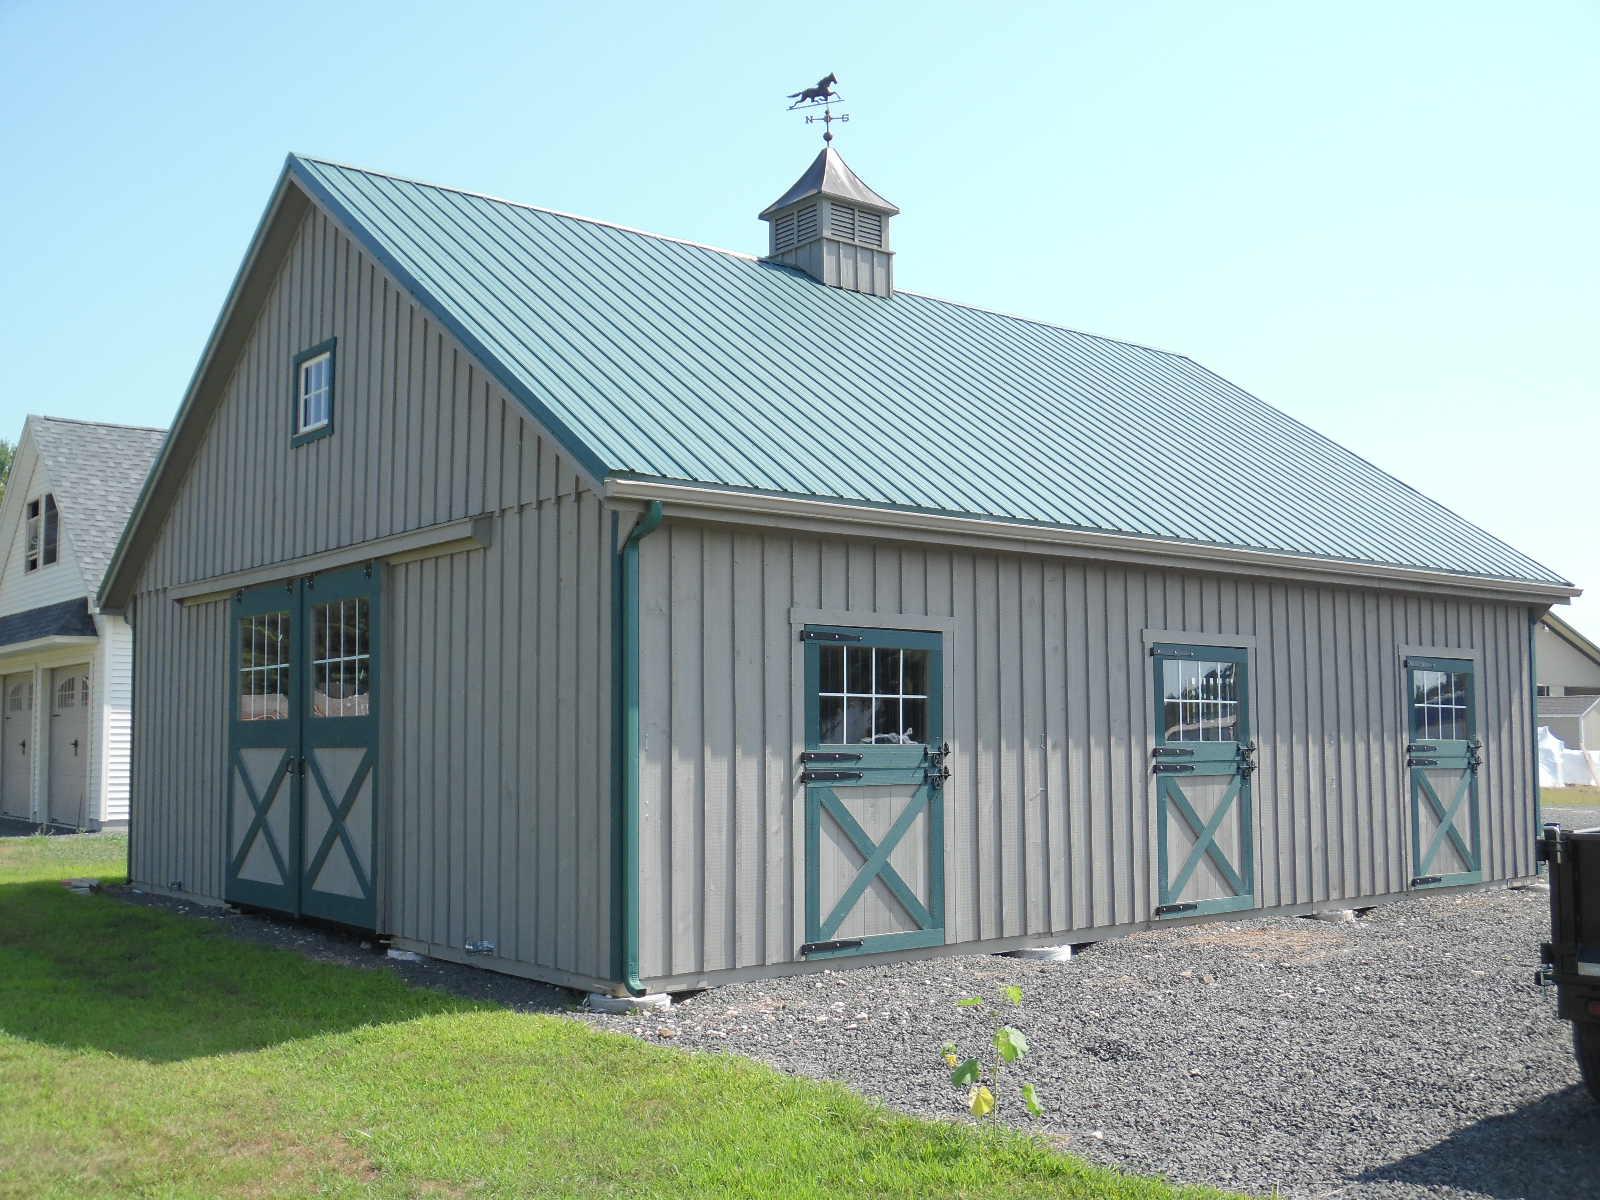 30 X 36 Horsebarn Board And Batten Hometown Structures